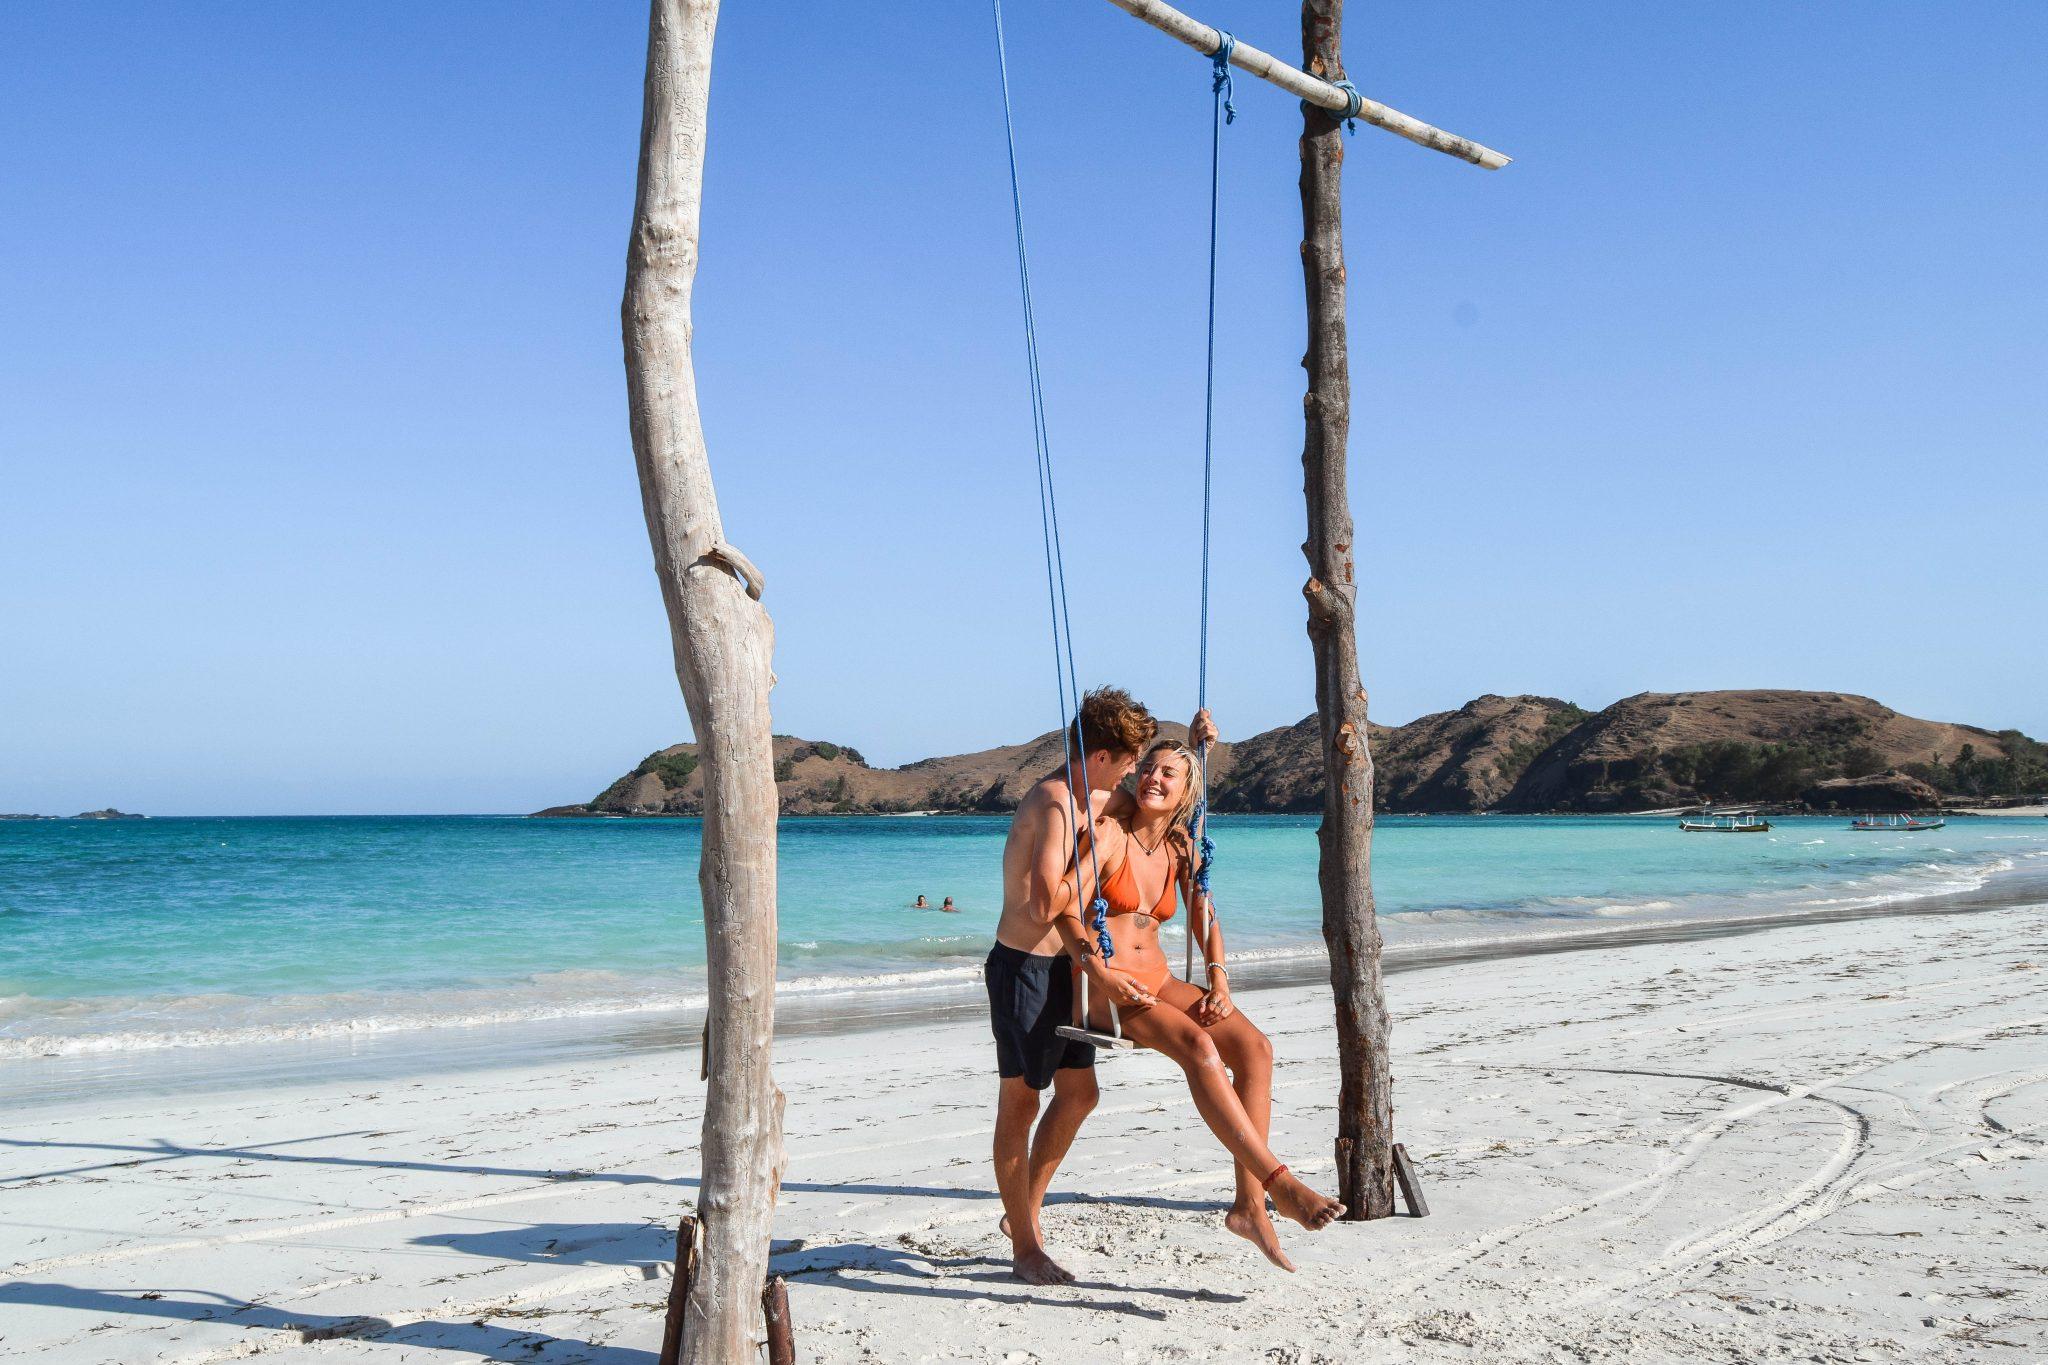 Wanderers & Warriors - Charlie & Lauren UK Travel Couple - Tanjung Aan Beach - Tanjung Aan Lombok Things To Do In Kuta Lombok